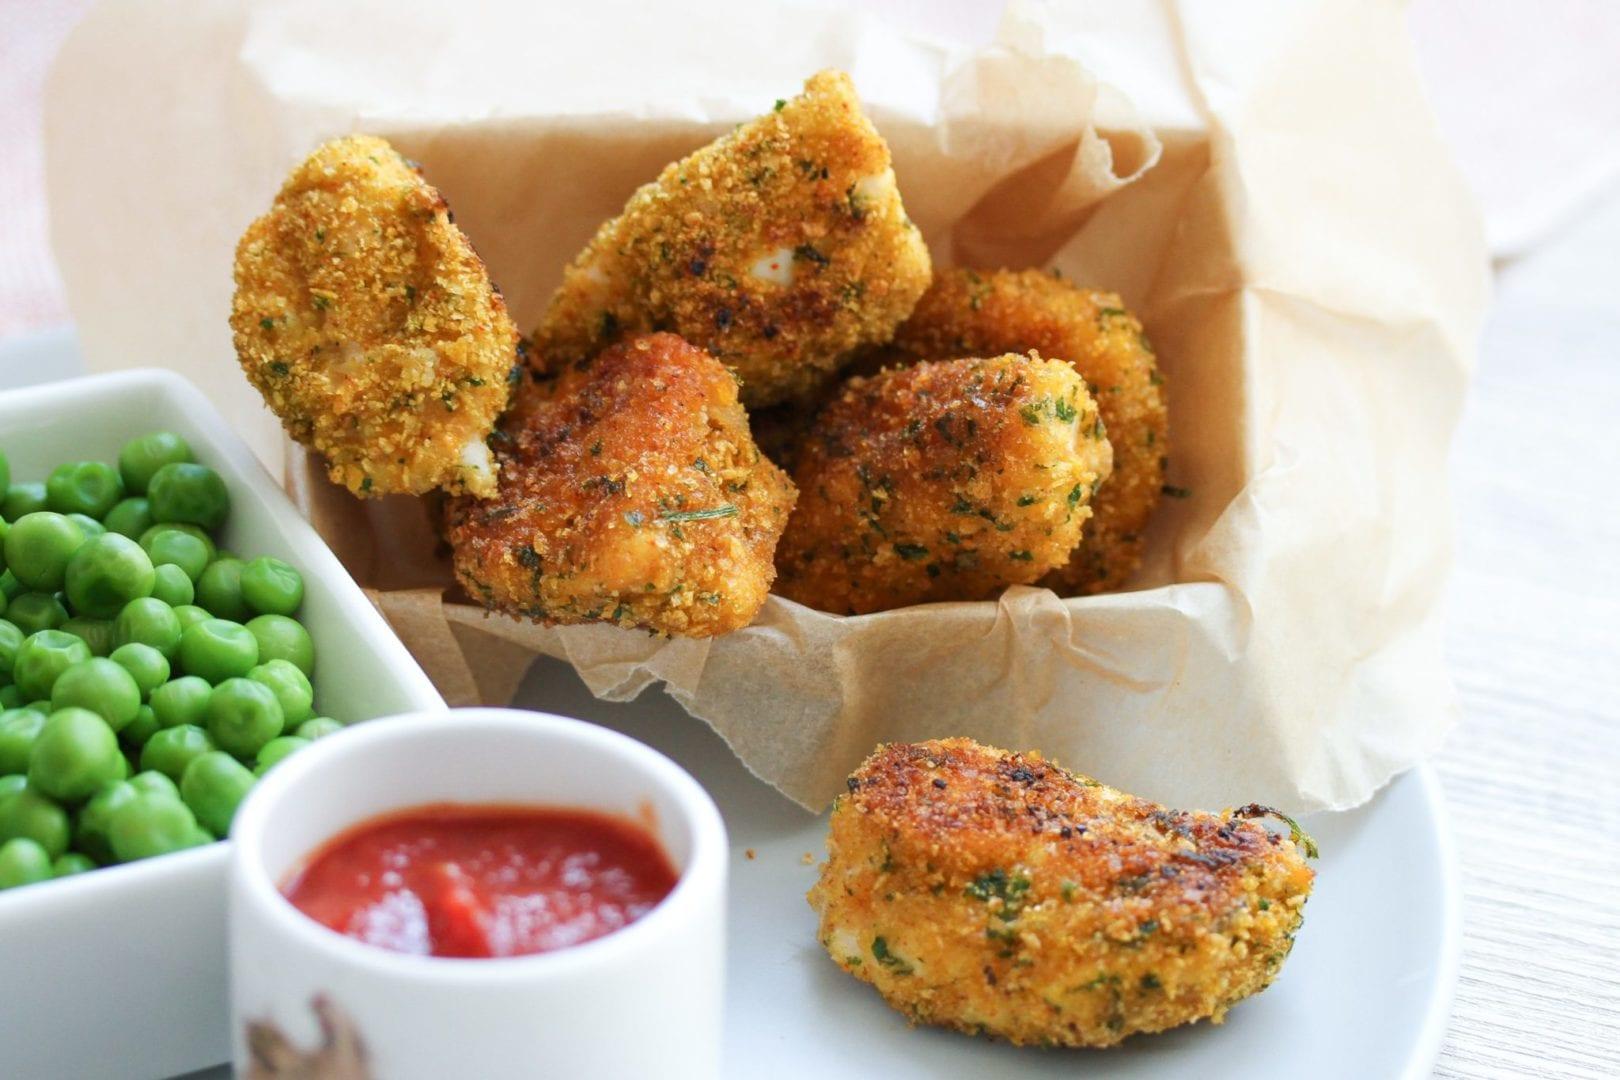 Gluten free chicken nuggets - healthy kids recipes - ready 24